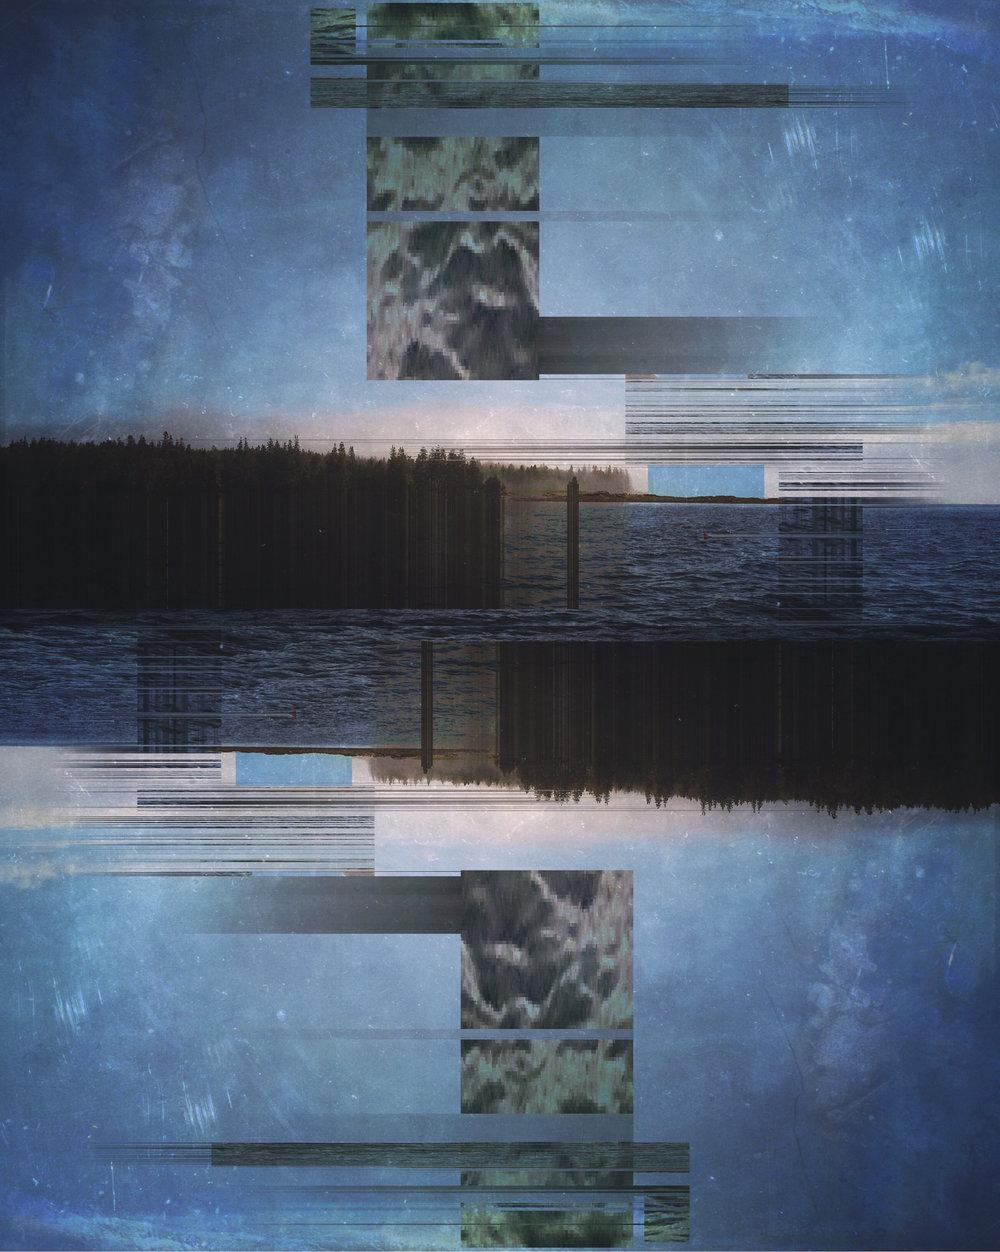 jlaurence_glitch-35.jpg